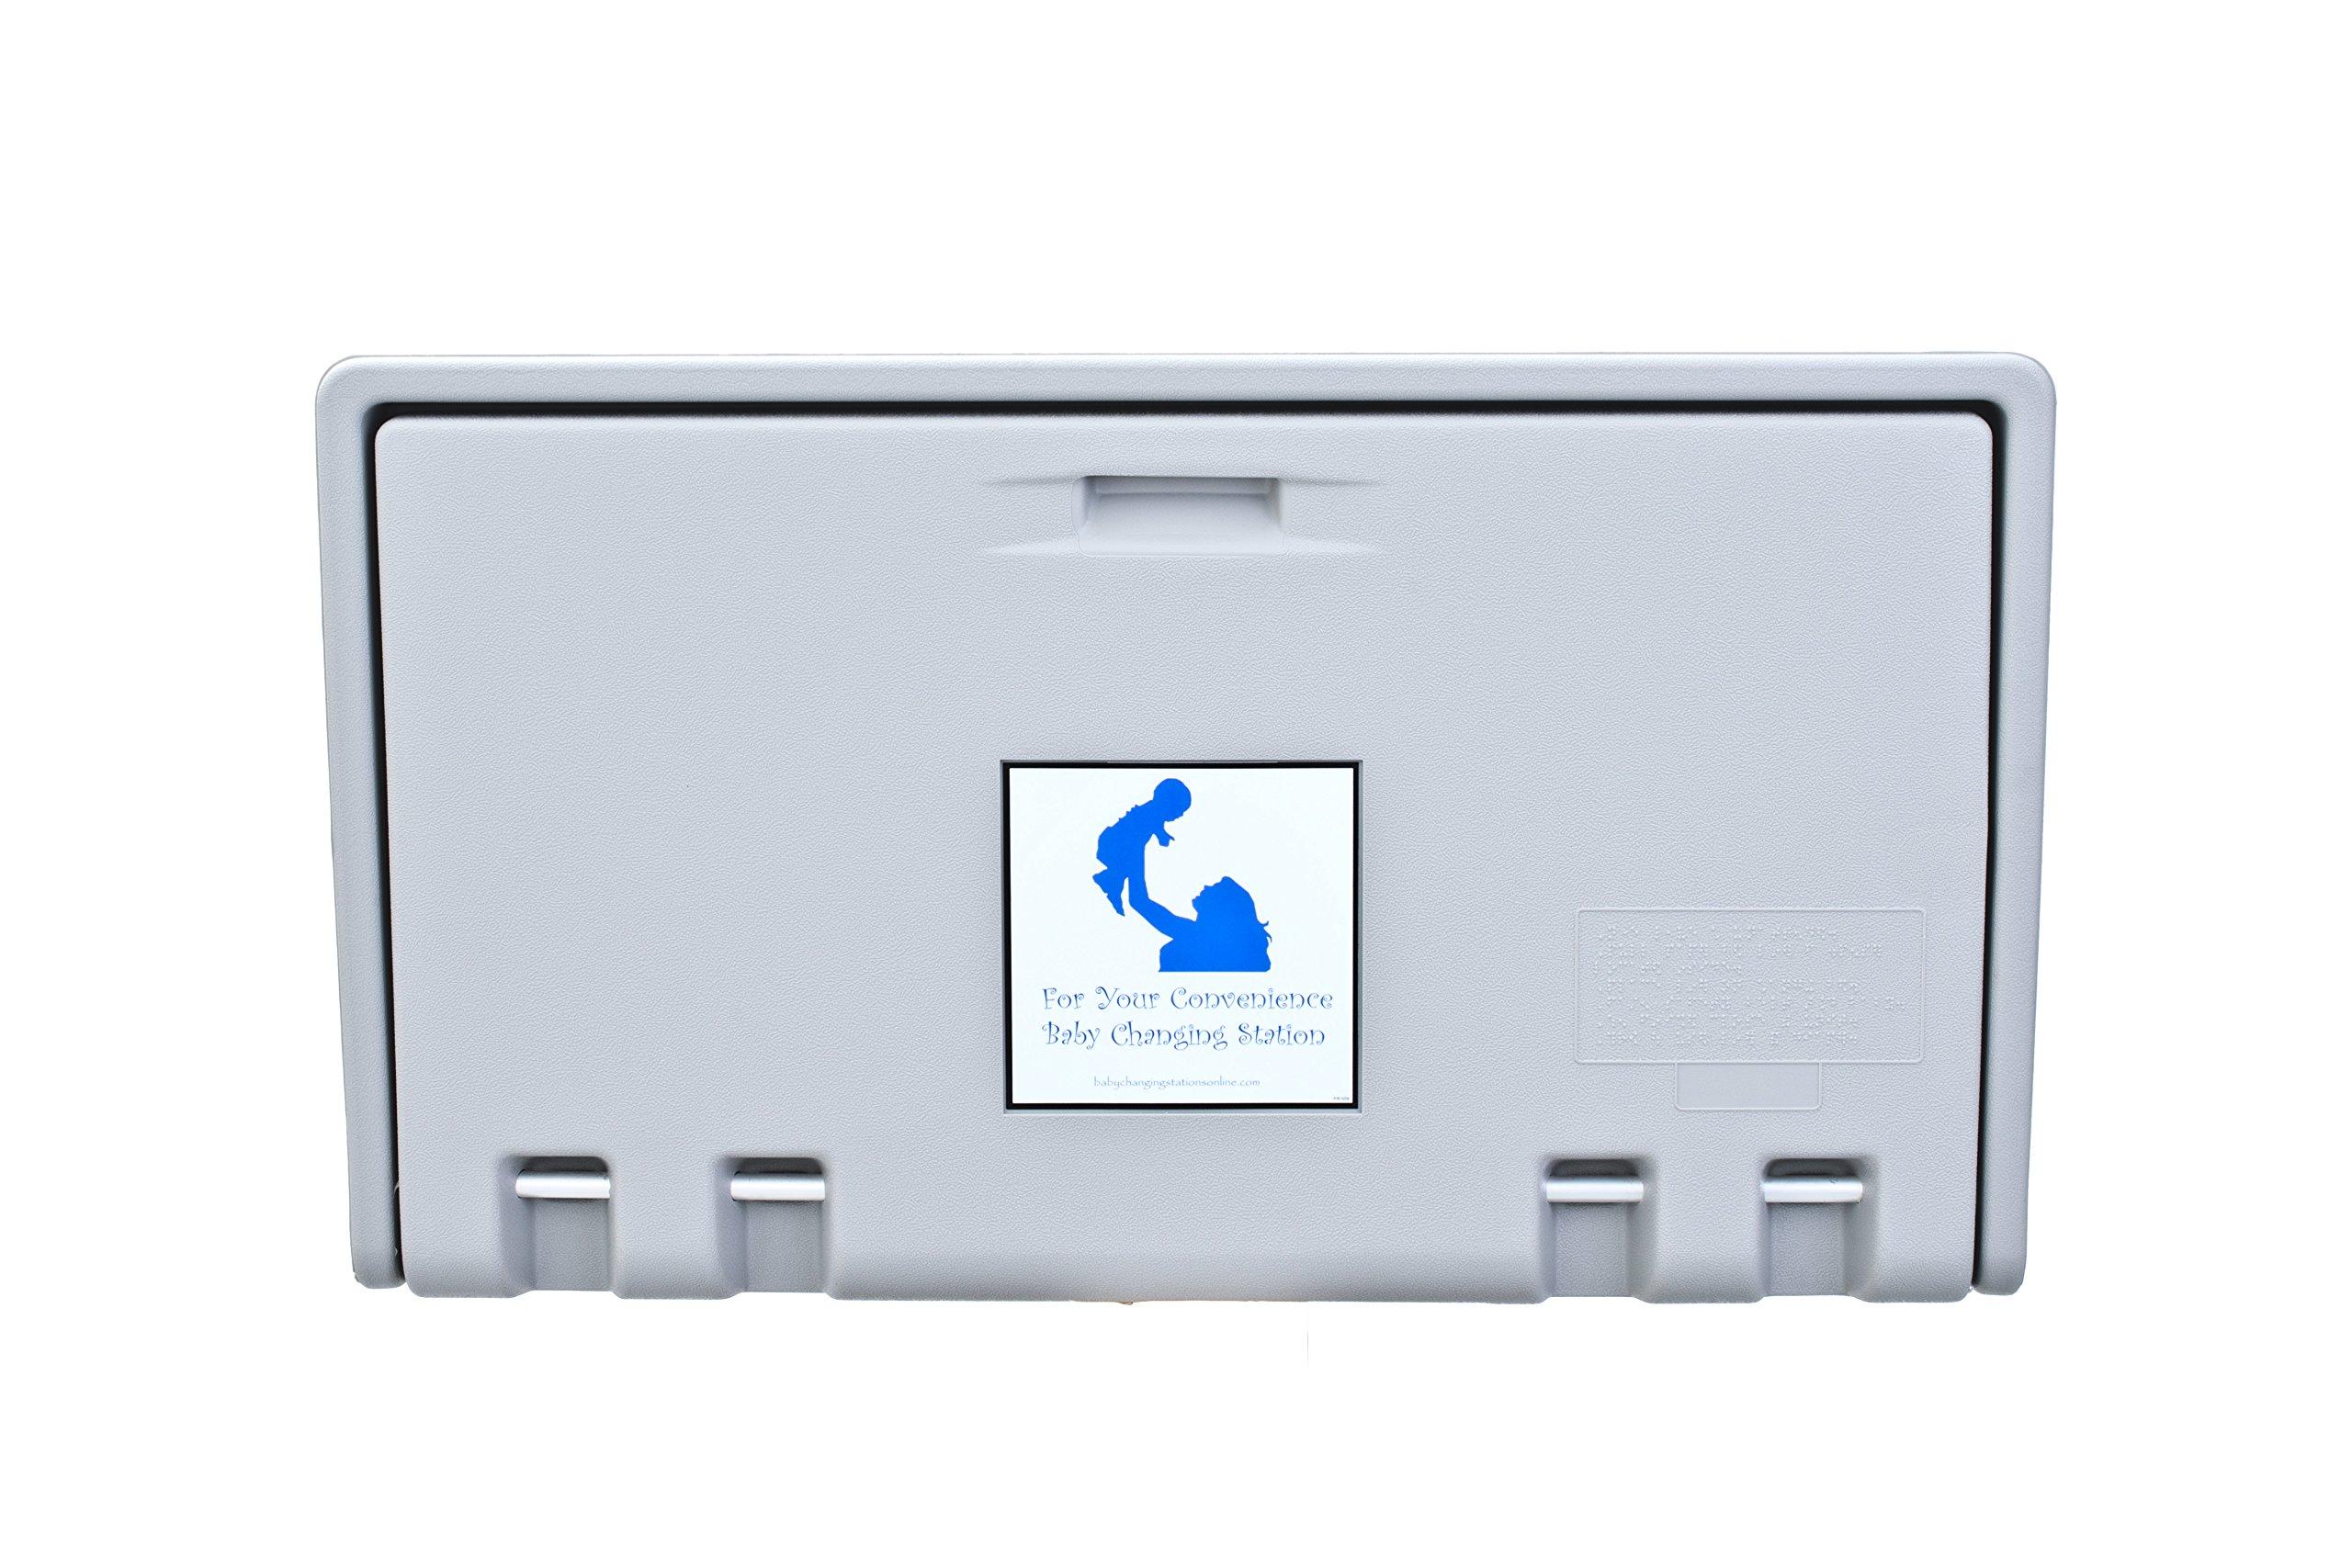 AHD107-01 Grey Horizontal Baby Changing Station